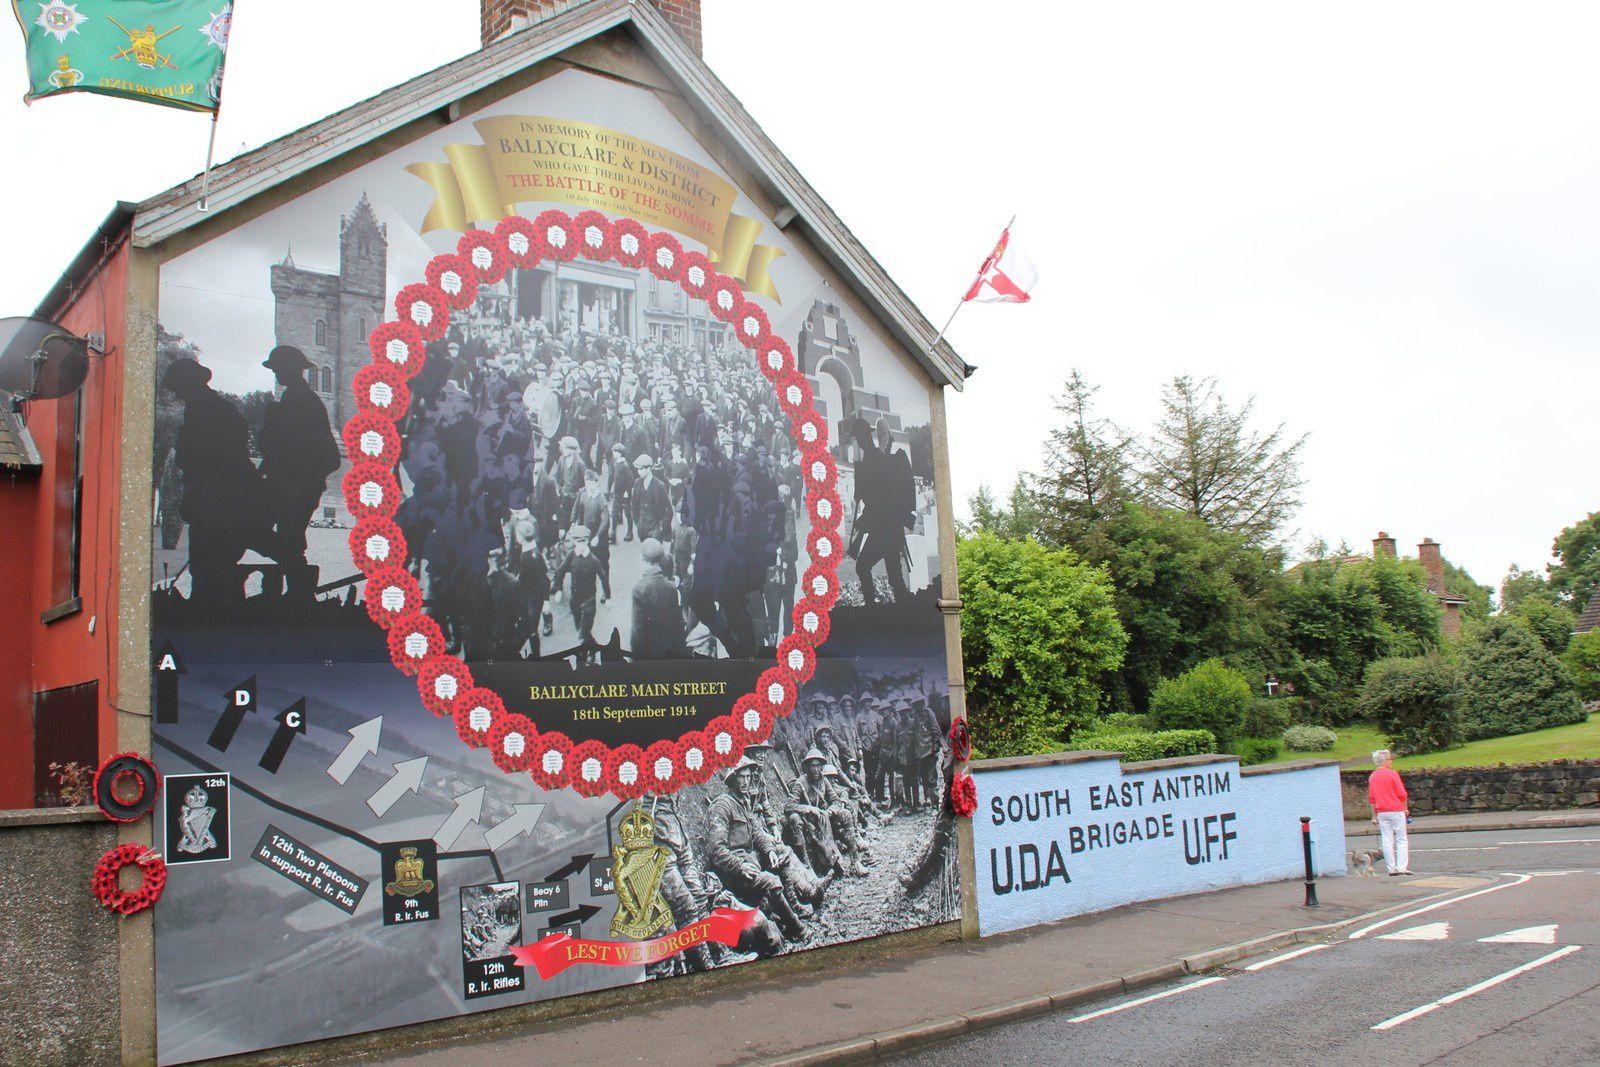 727) Erskine Park, Ballyclare, Antrim